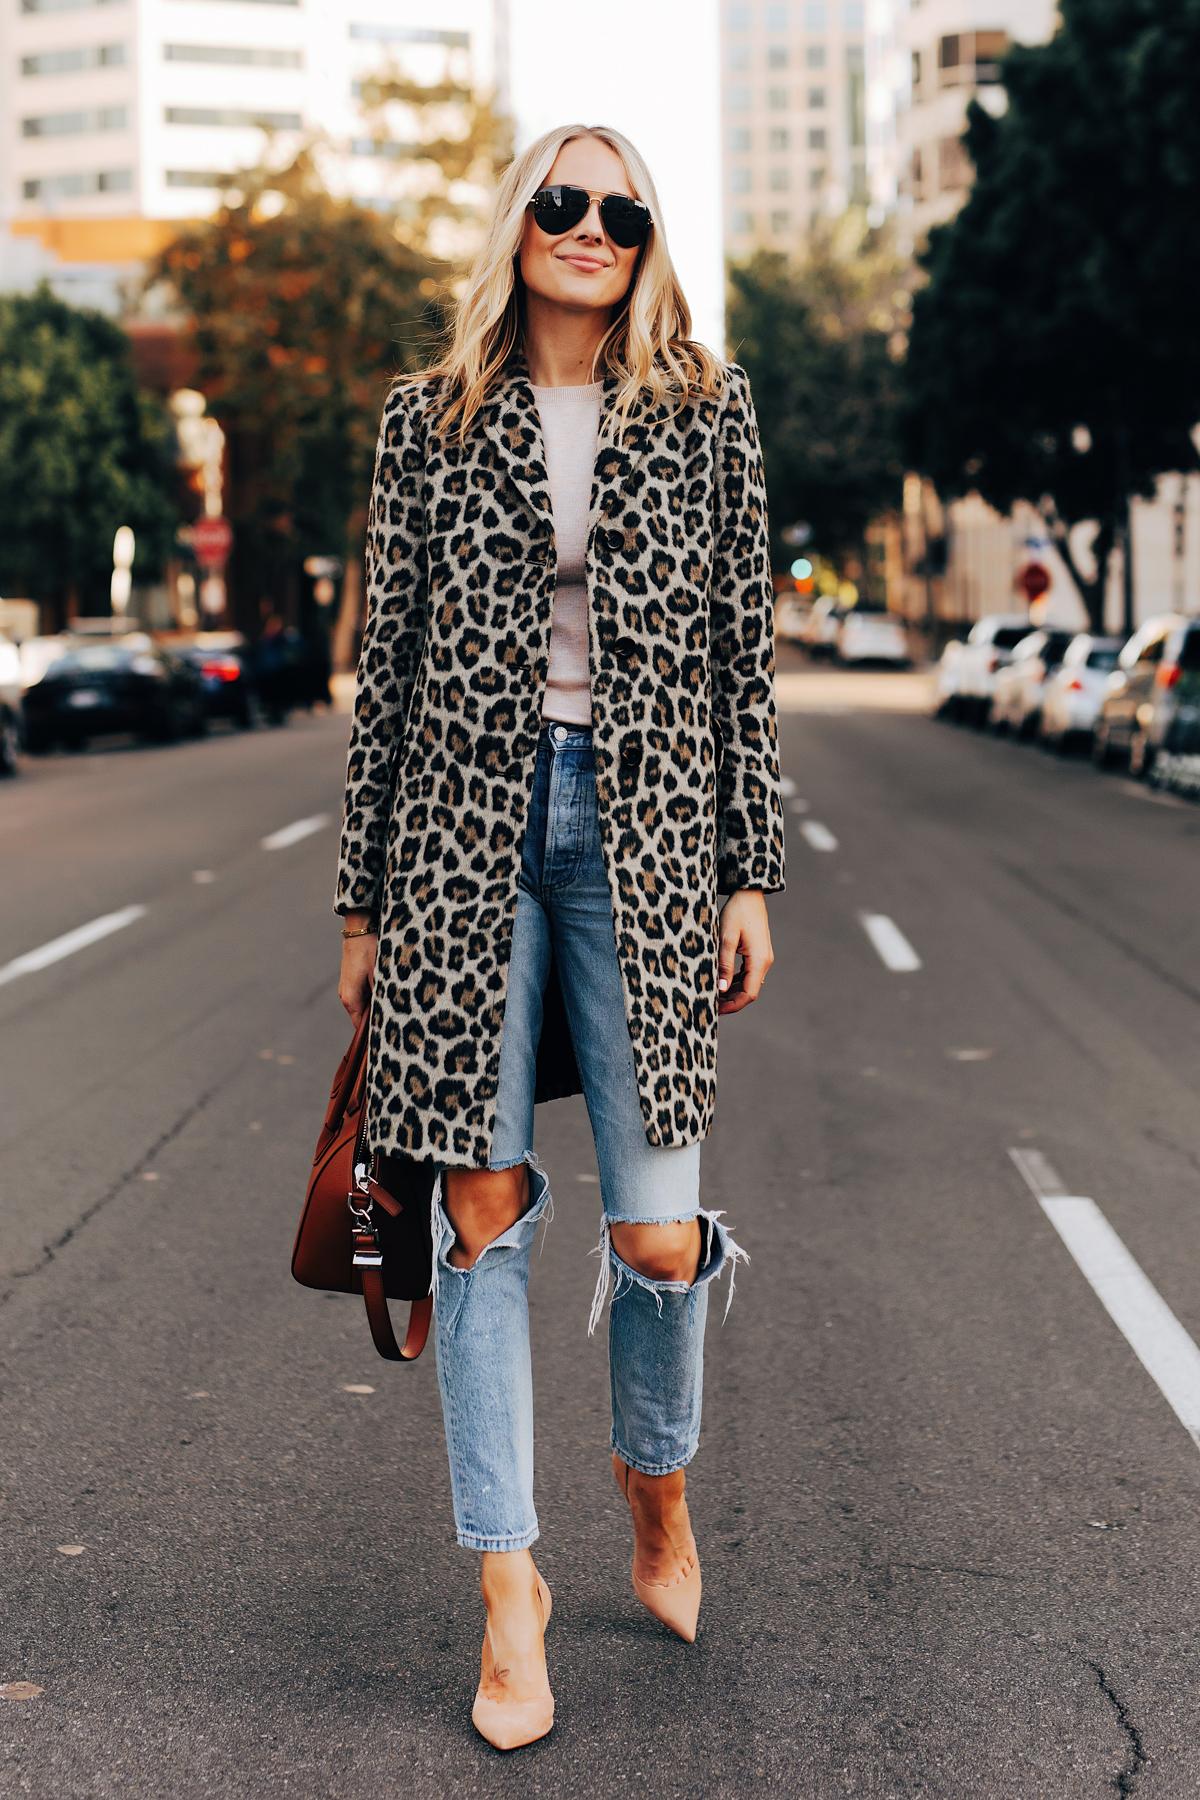 Fashion Jackson Wearing Ann Taylor Leopard Coat Boyish Ripped Jeans Nude Pumps